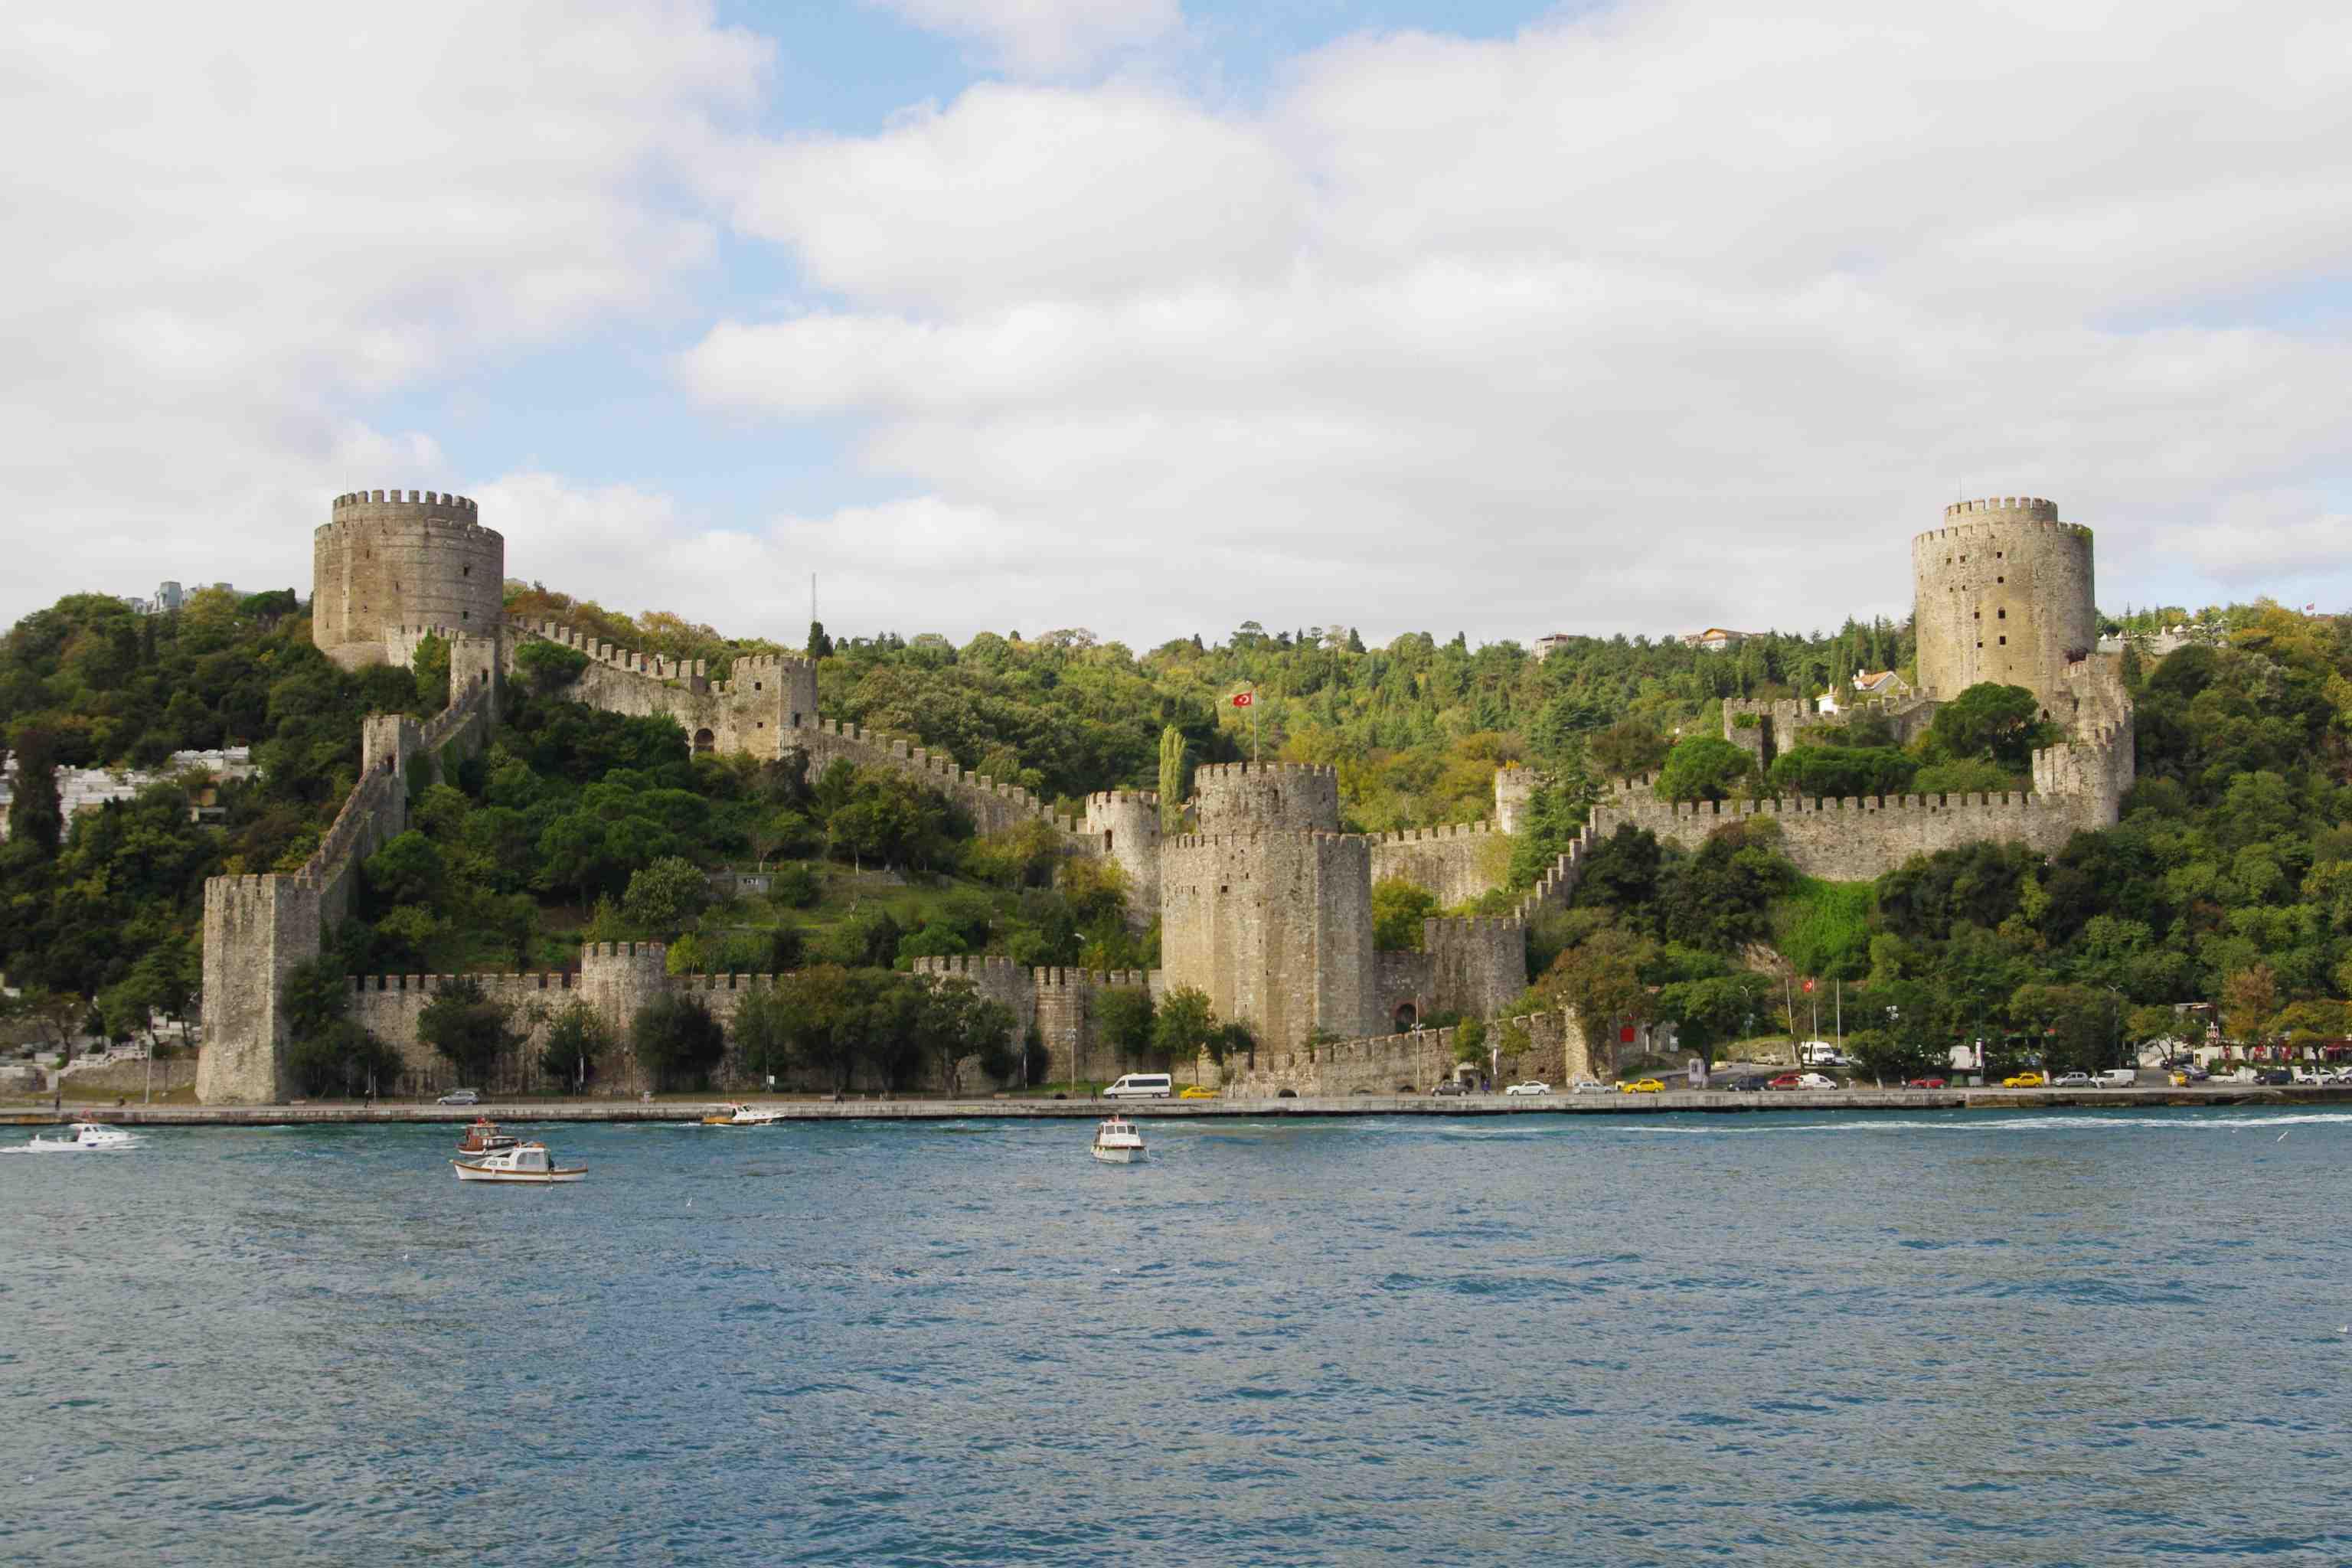 Eroberung Konstantinopel